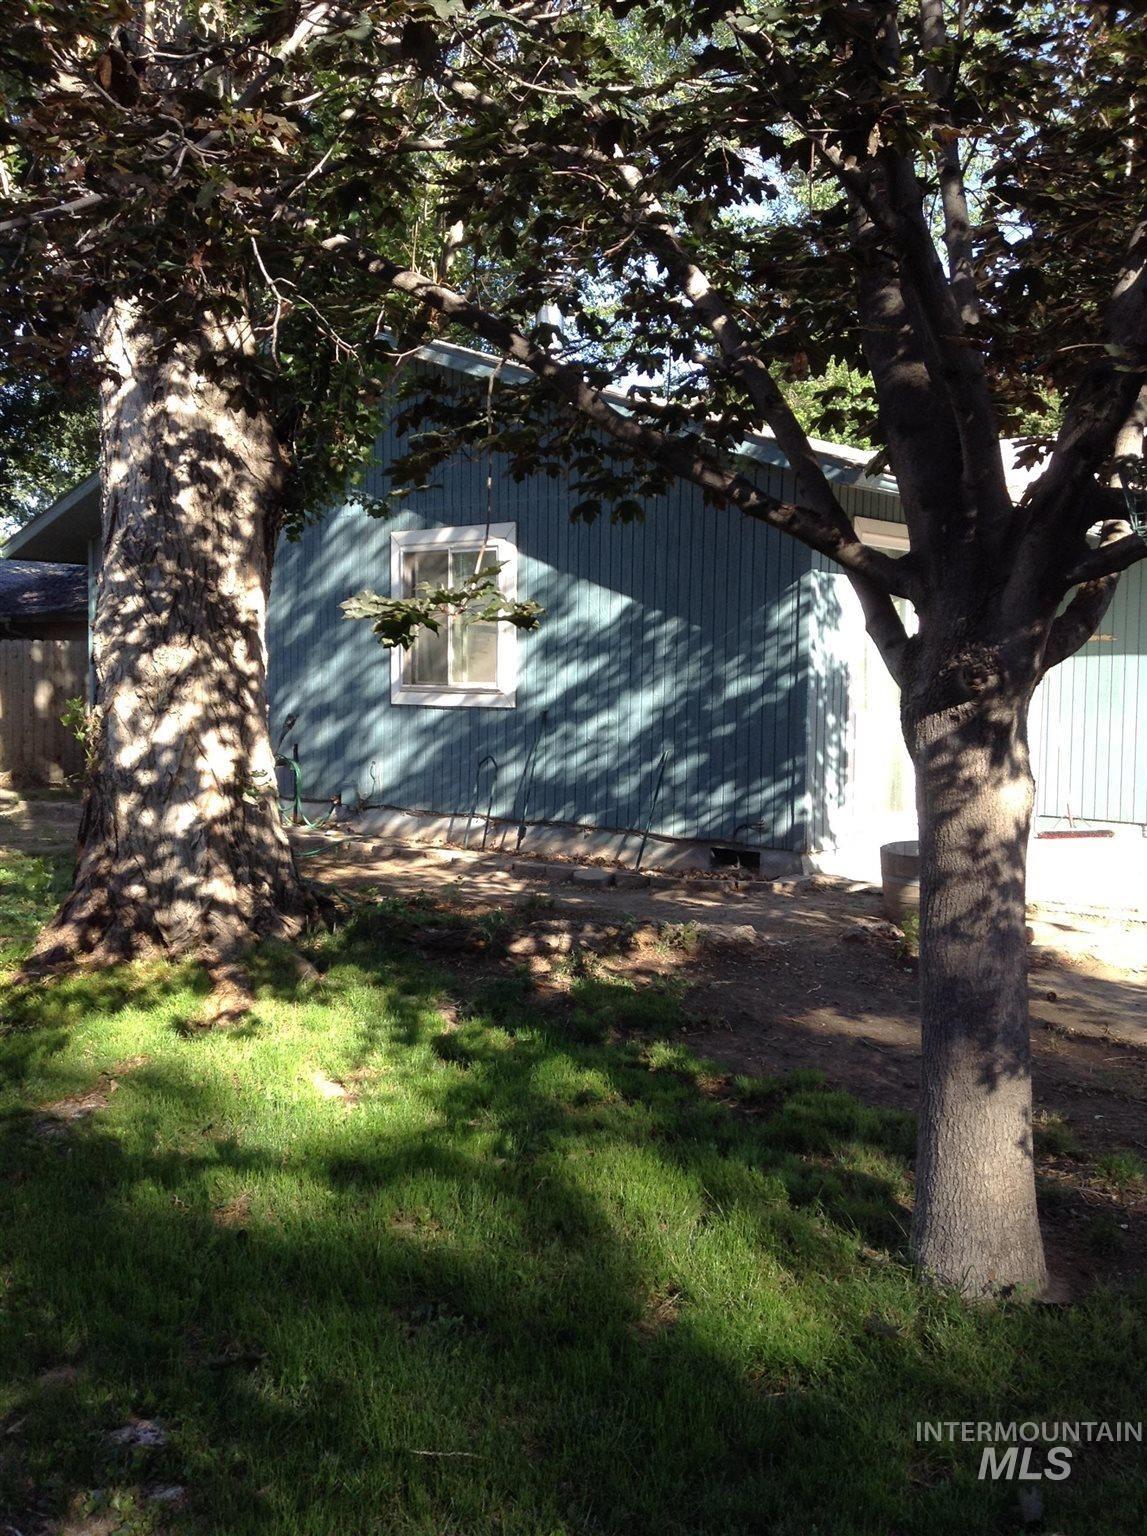 Photo of 411 W 4th N, Mountain Home, ID 83647-2502 (MLS # 98807237)